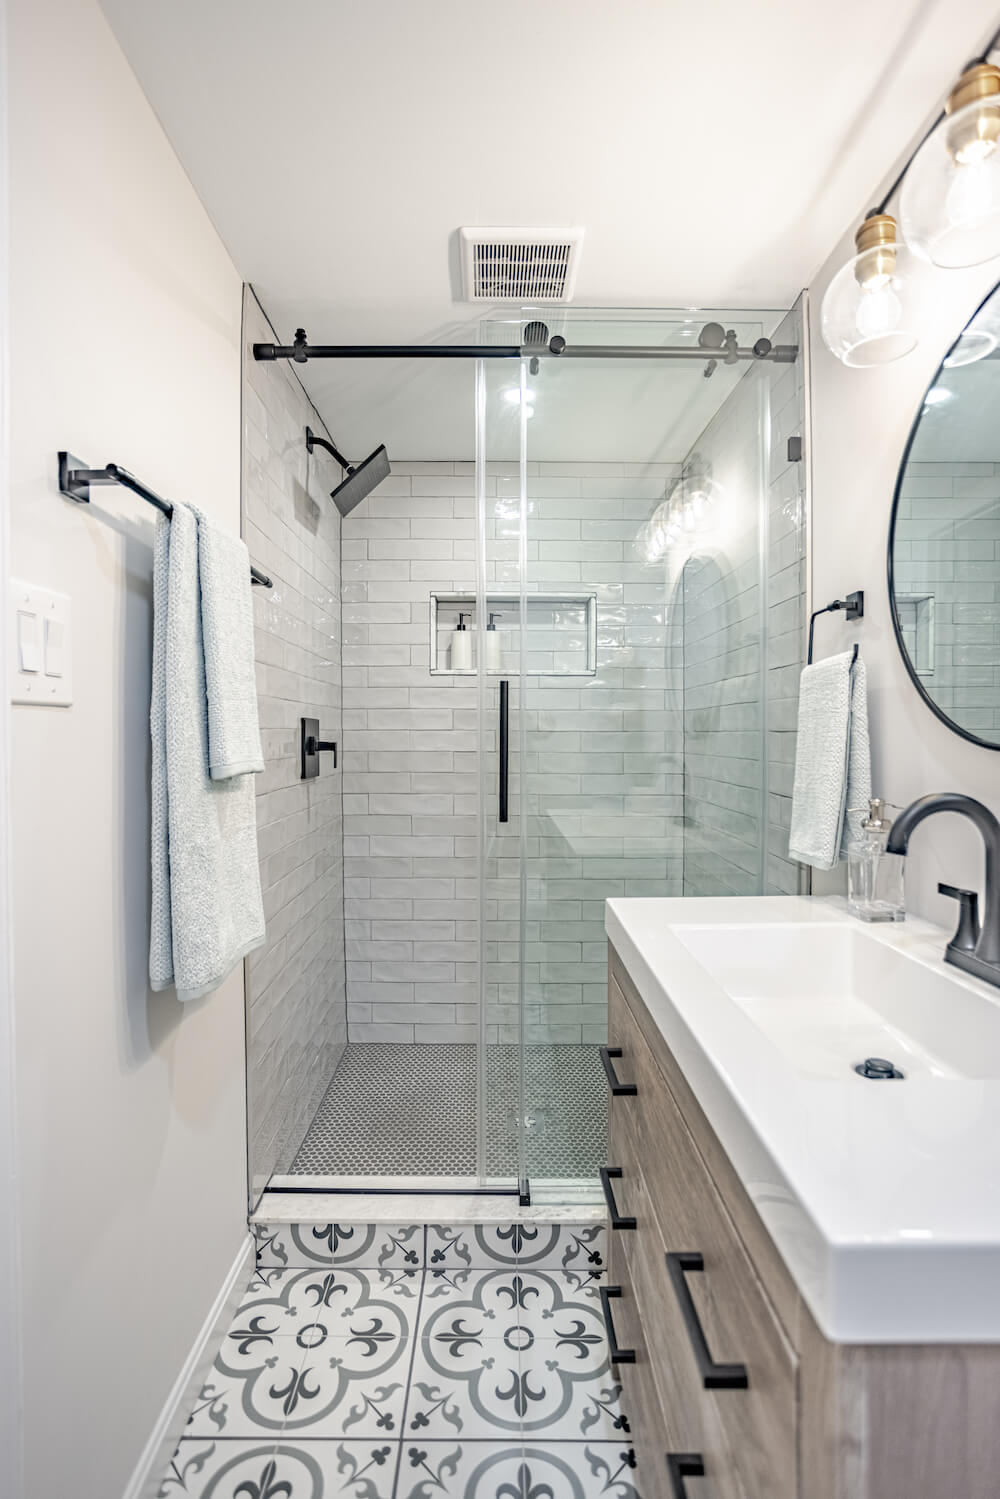 A modern bathroom design of Moroccan tile floor and subway tile shower